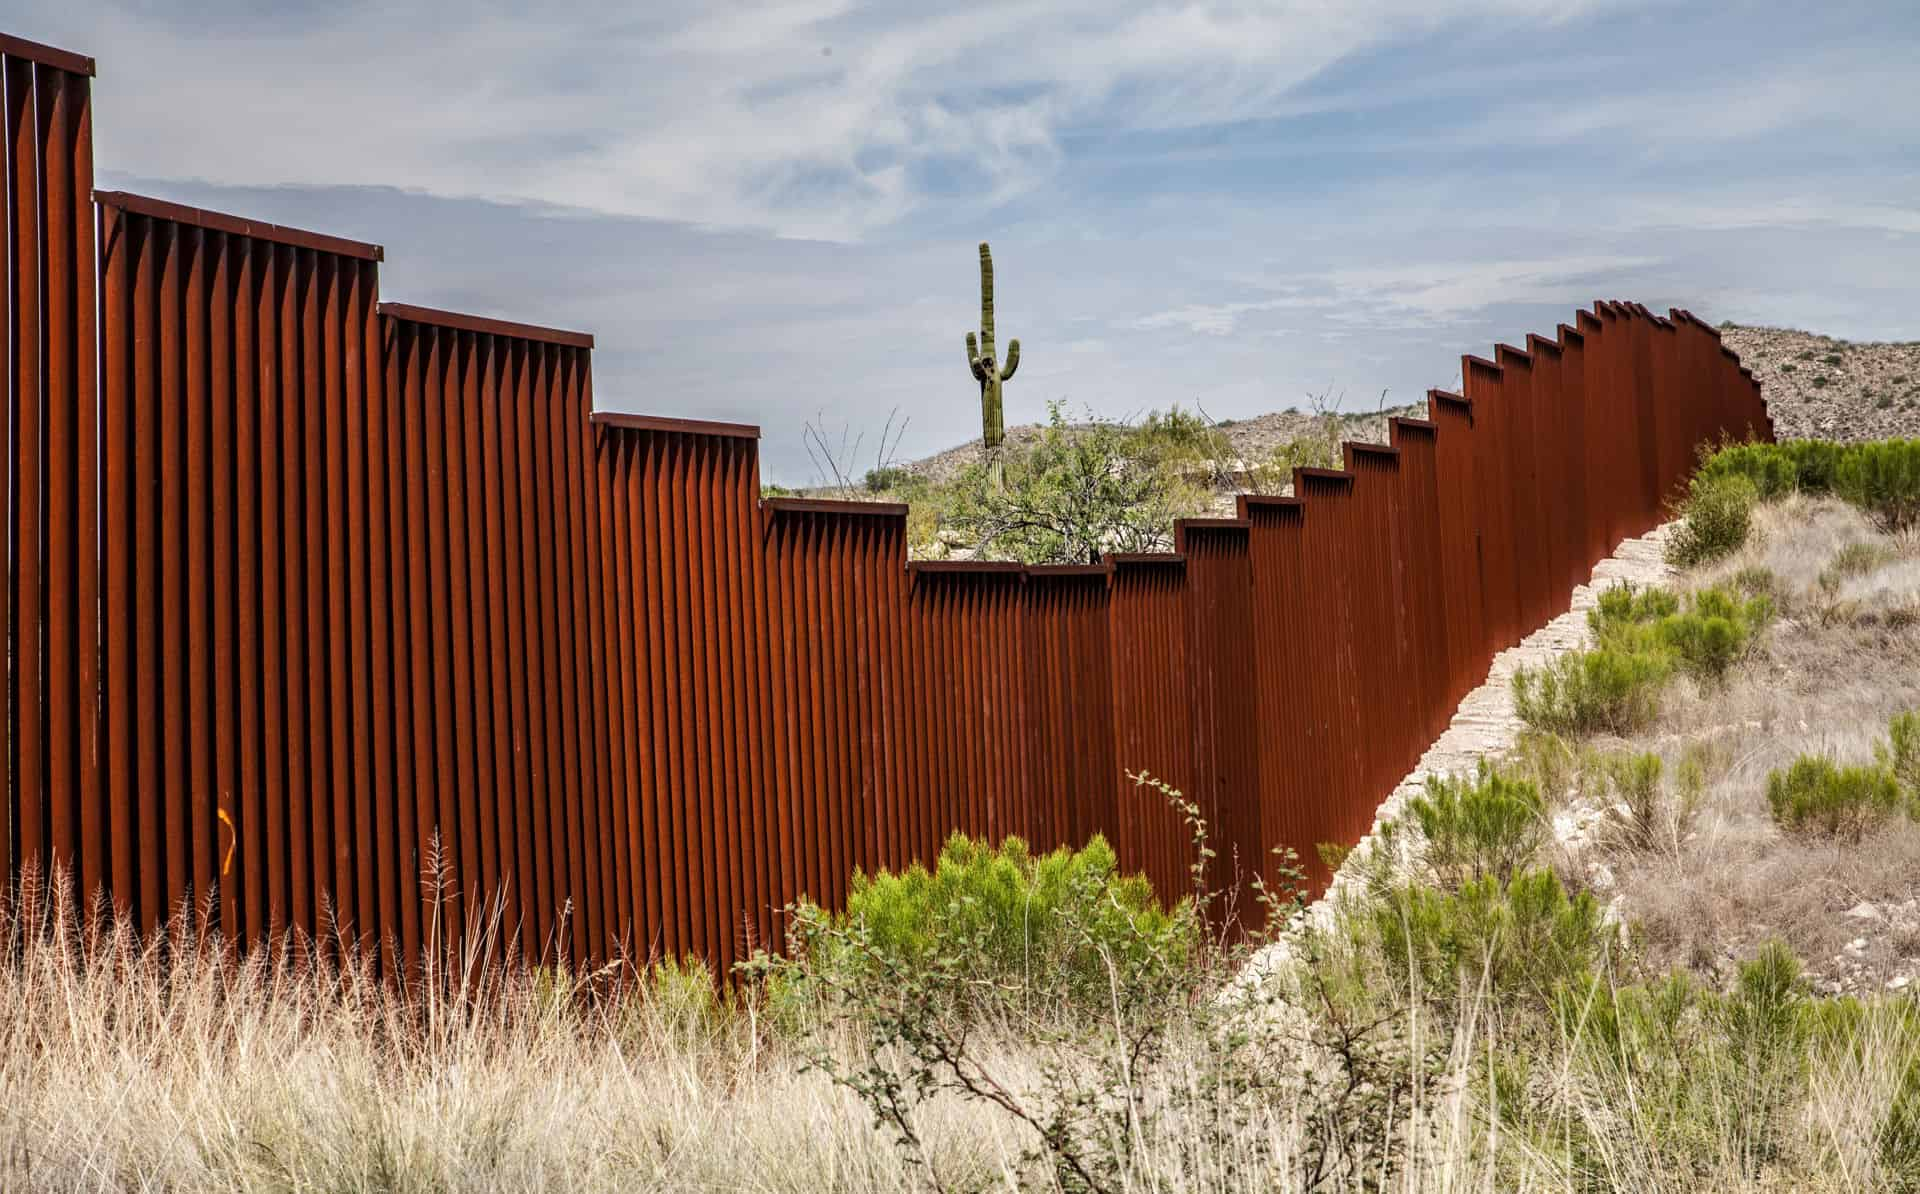 Mexican American Border Wall